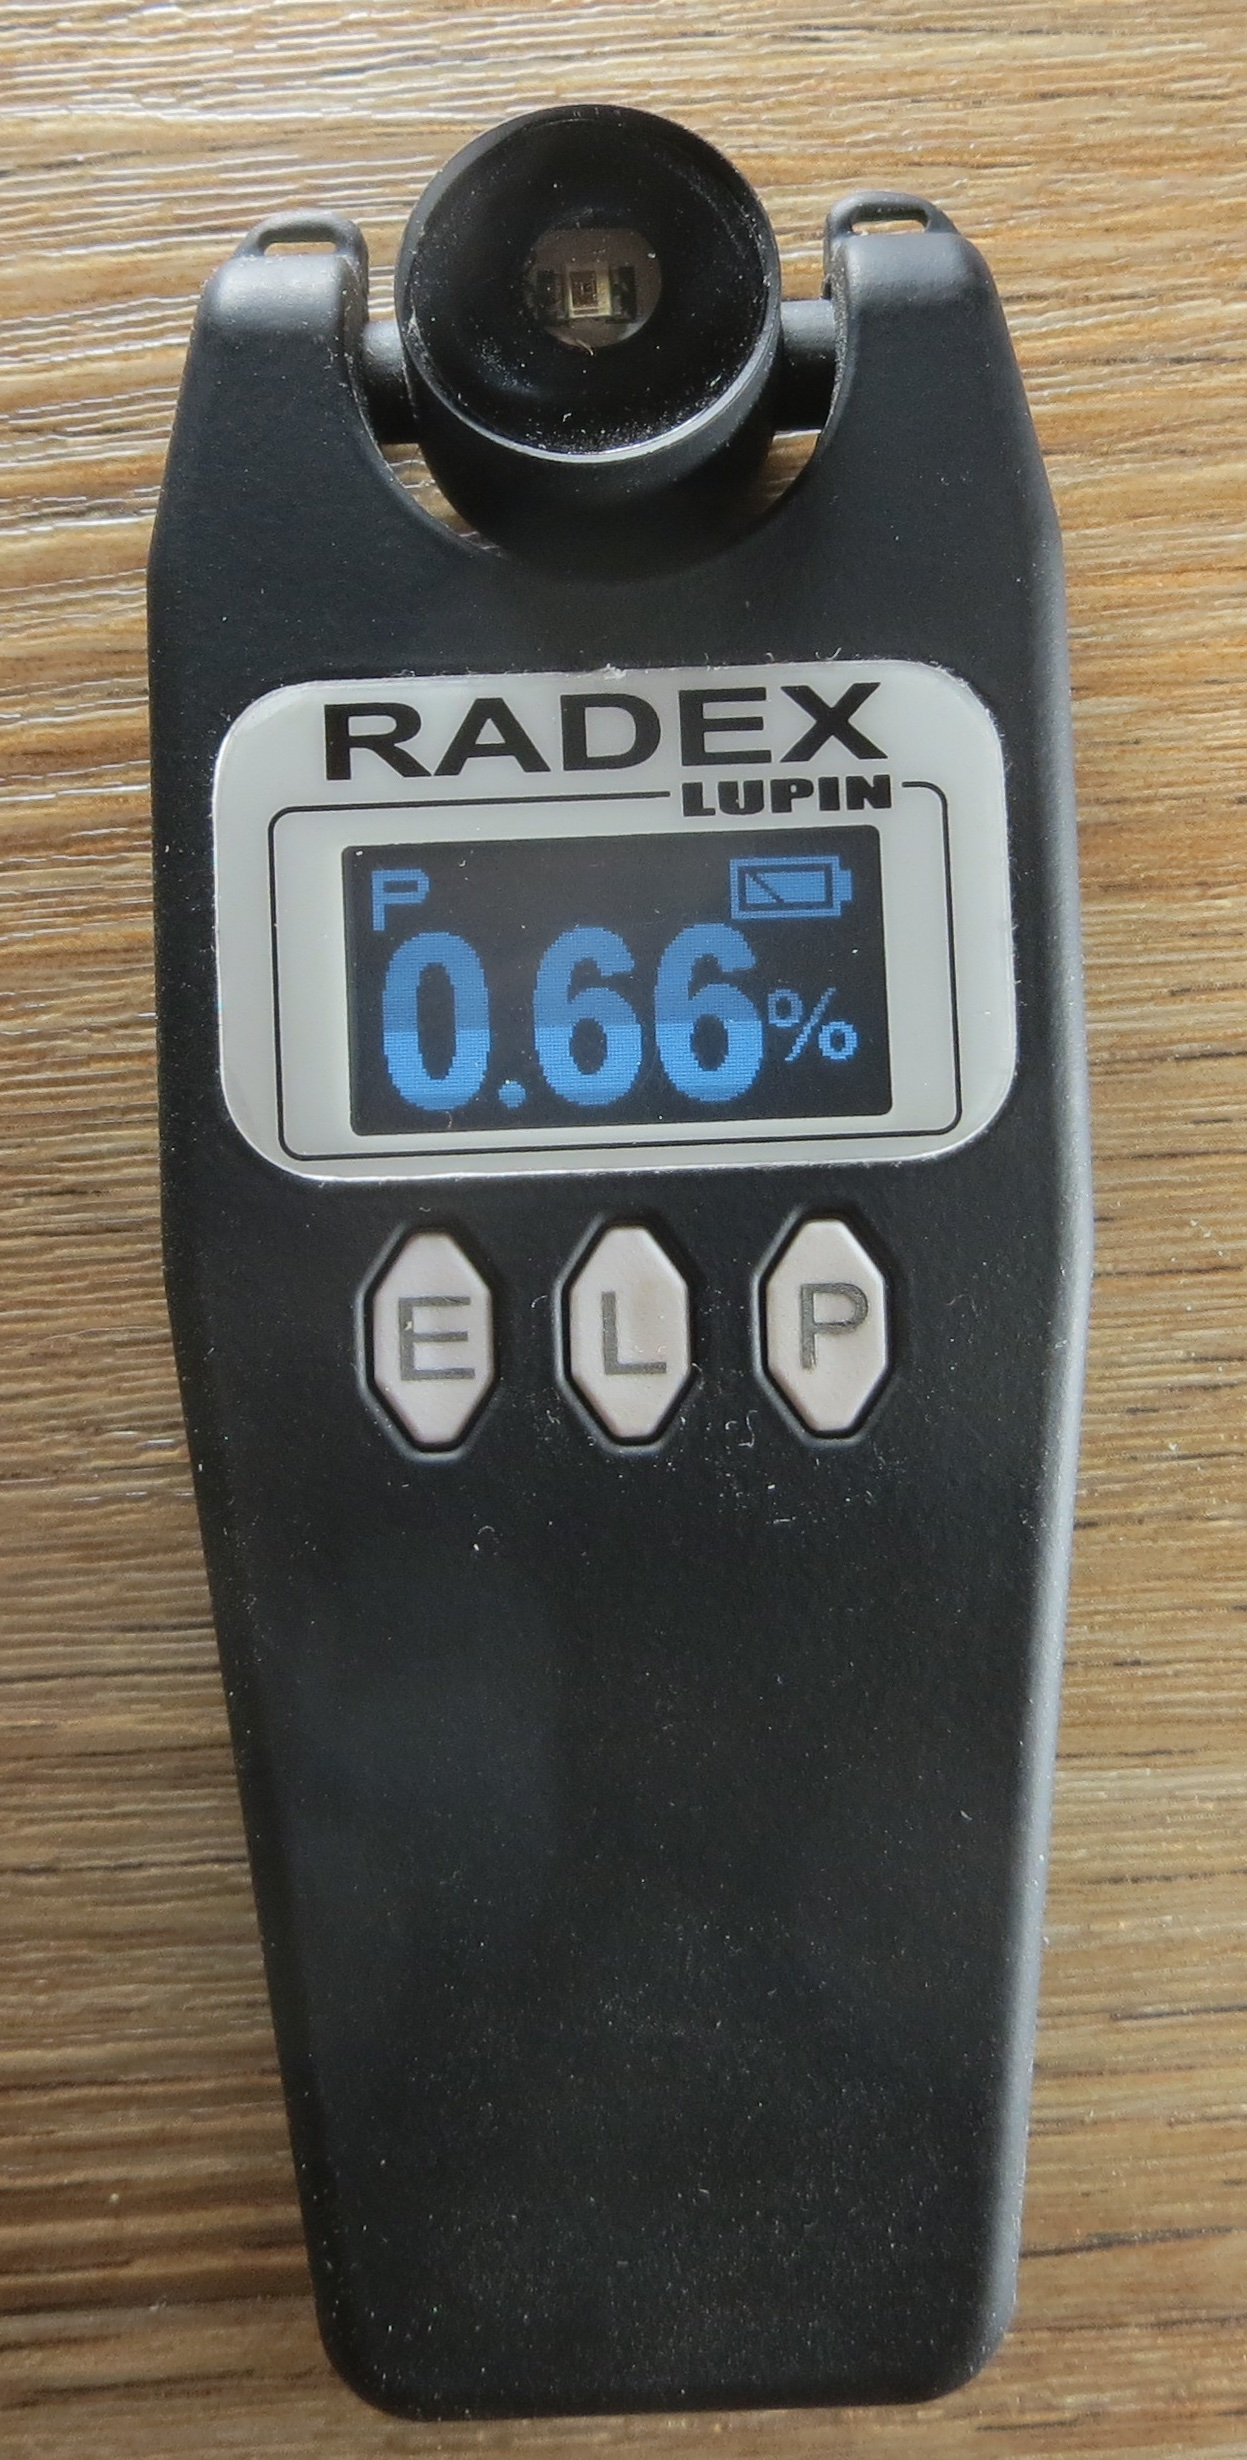 RADEX LUPIN